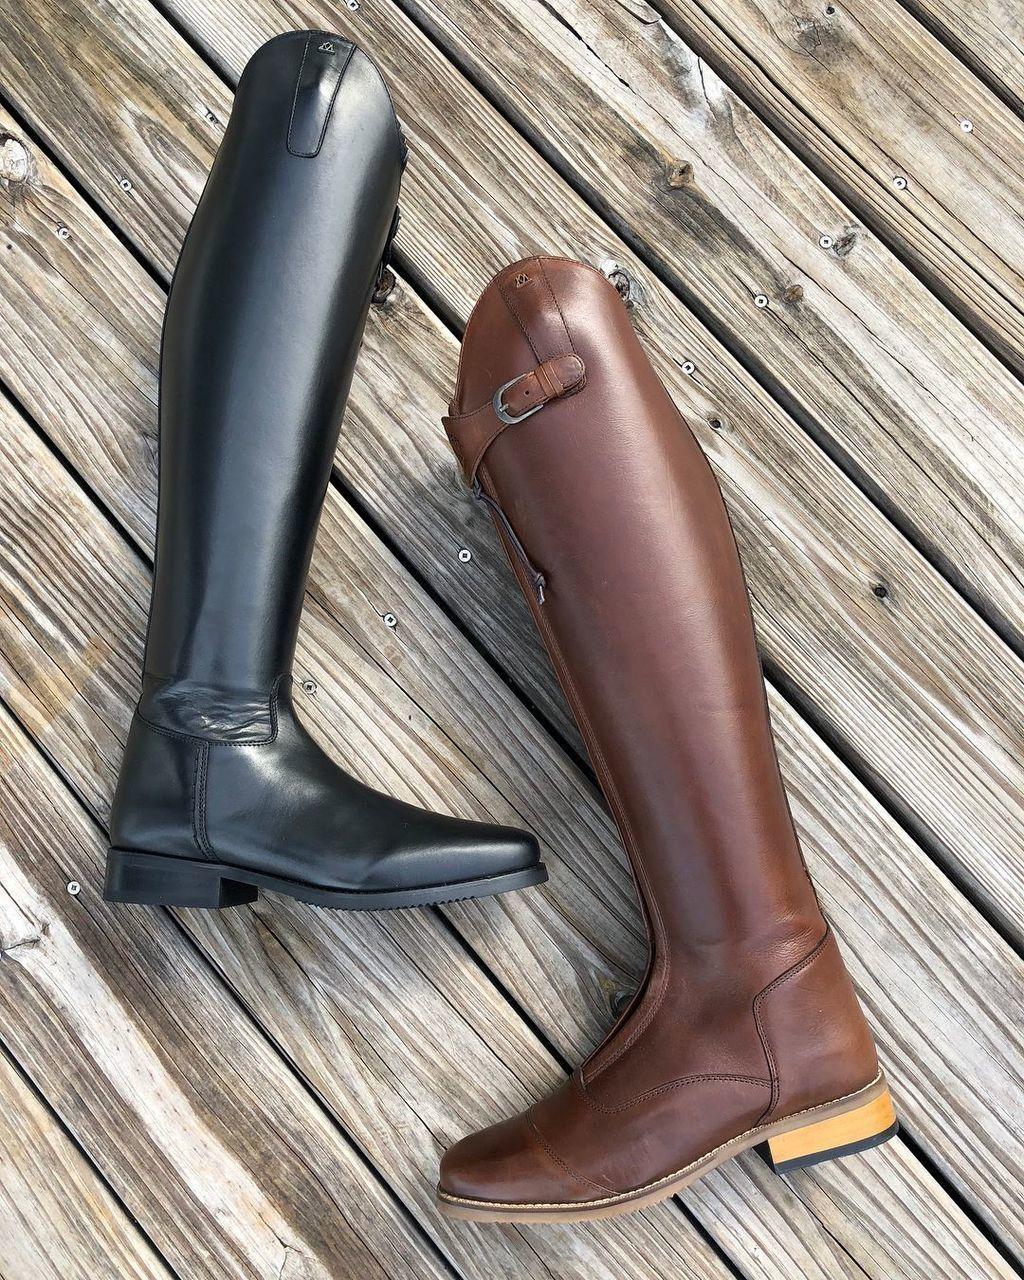 f1b991728b0a Mountain Horse Serenade Dressage Boots - Black - Centerline Style Equestrian  Boutique